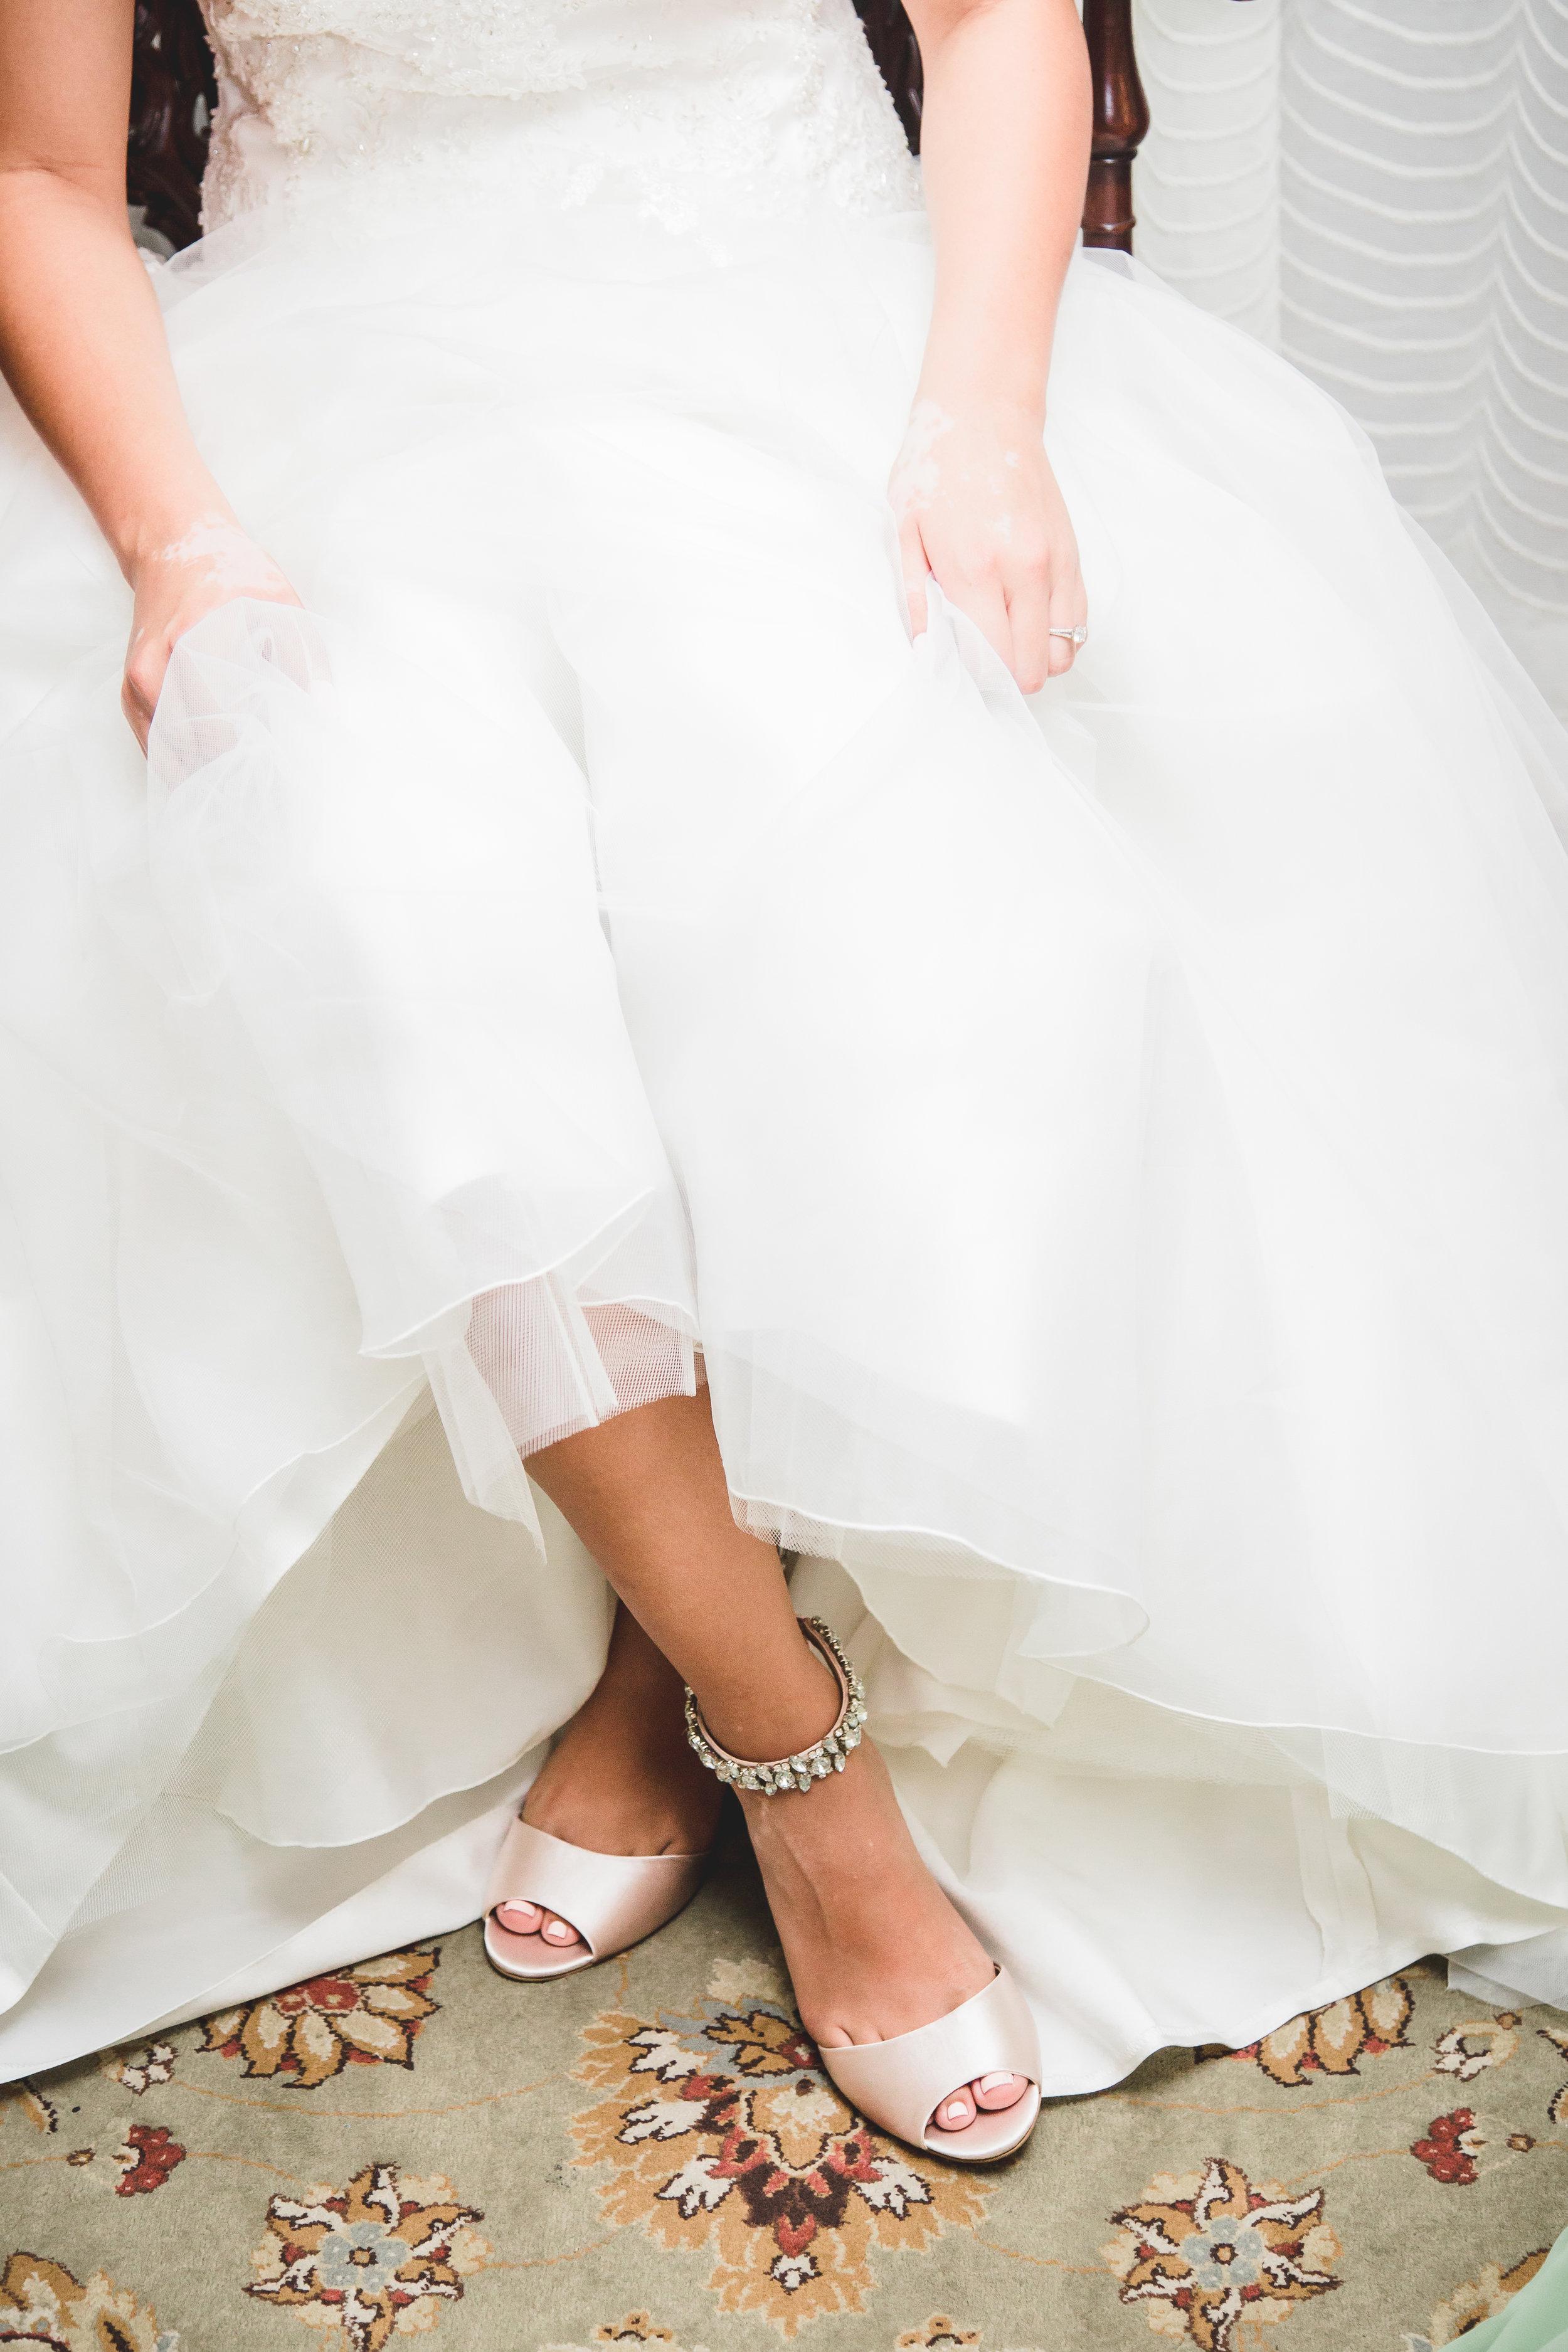 2018-09-07-WEDDING-MCBRIDE-TERRY-59.jpg